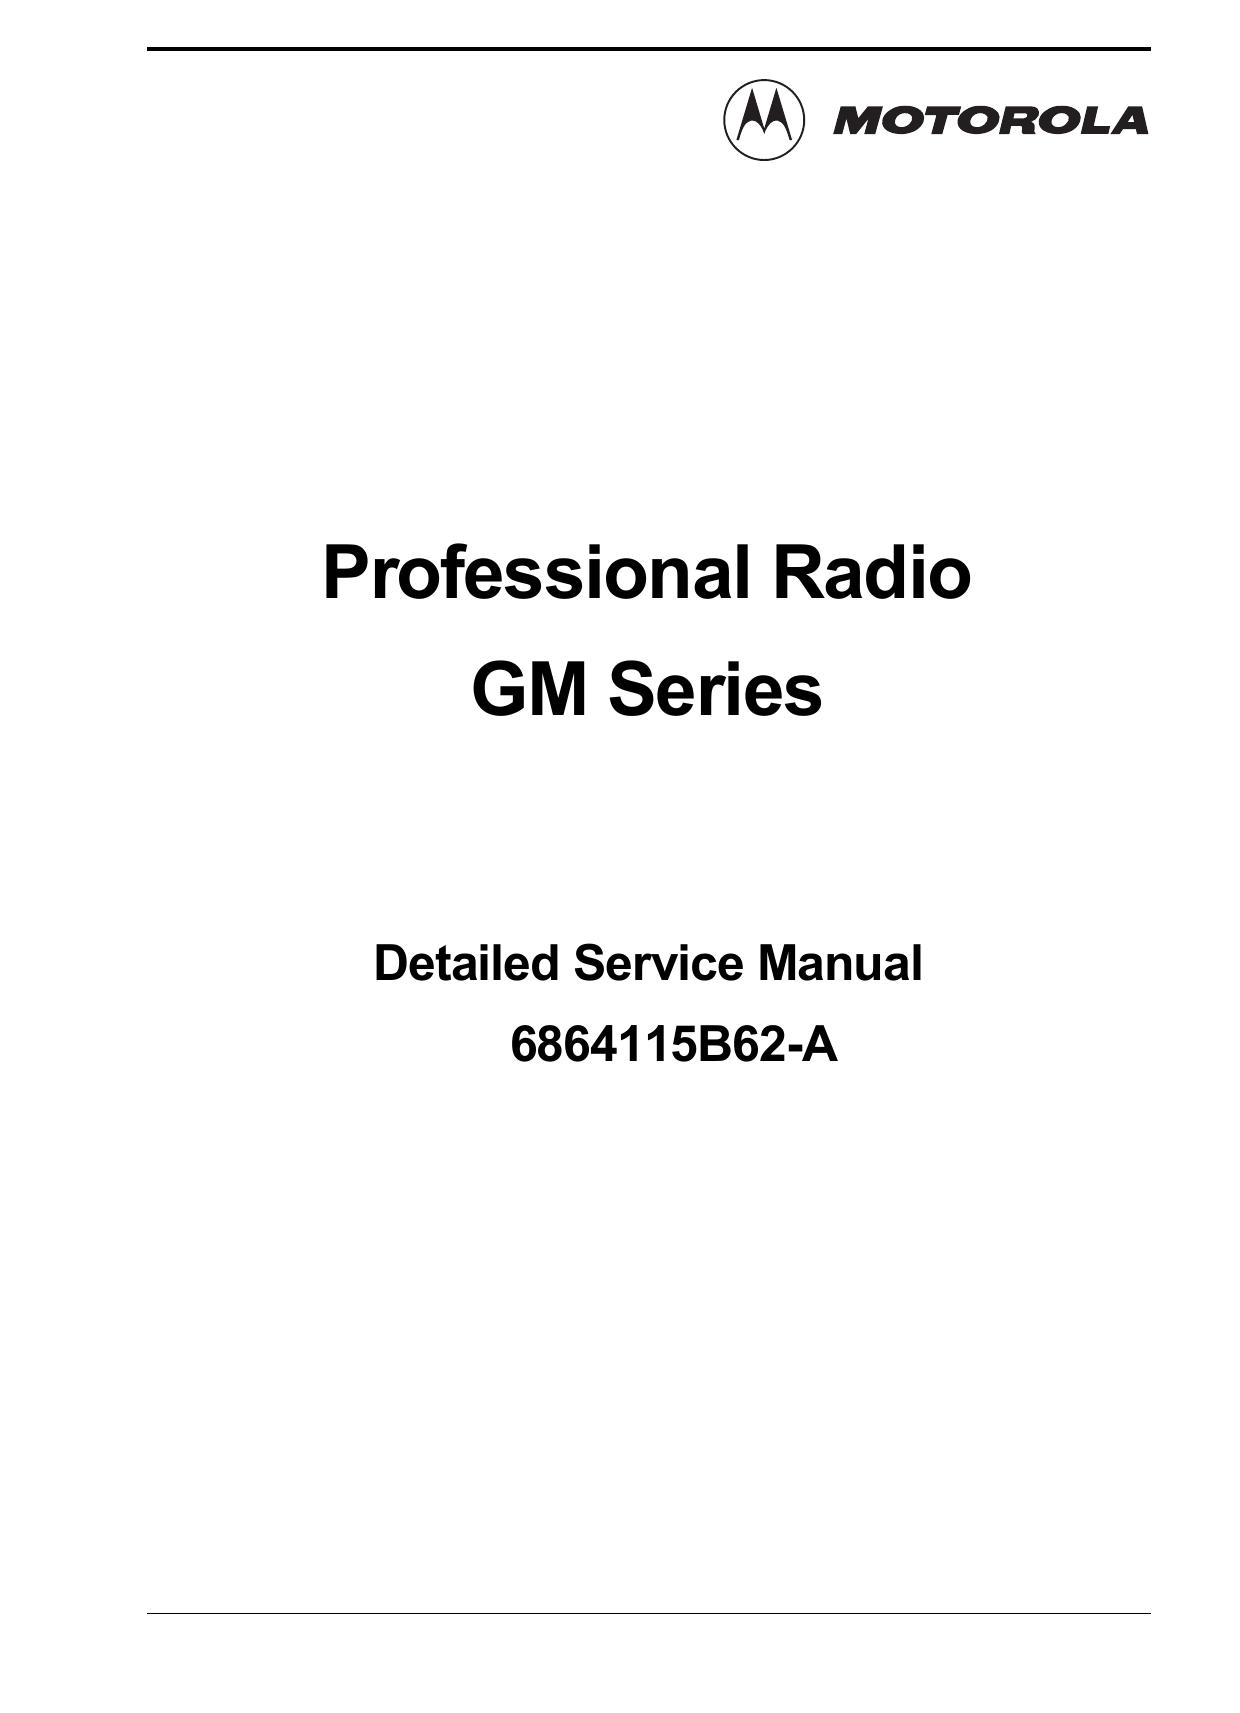 Professional Radio GM Series | manualzz com